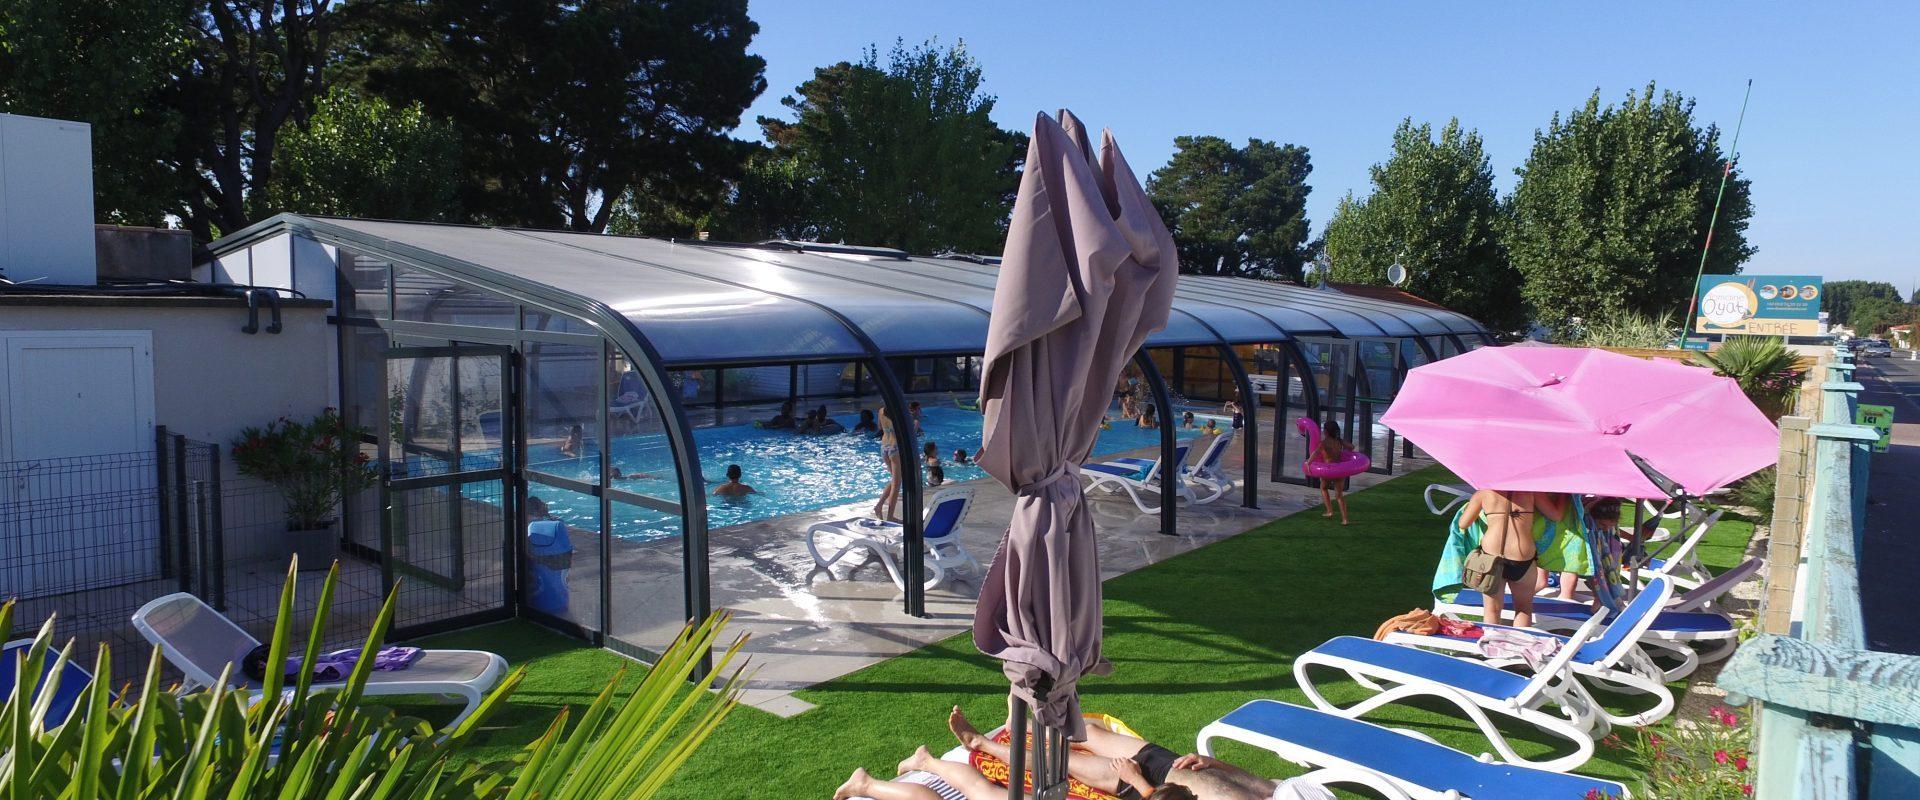 vue globale piscine couverte camping vendée